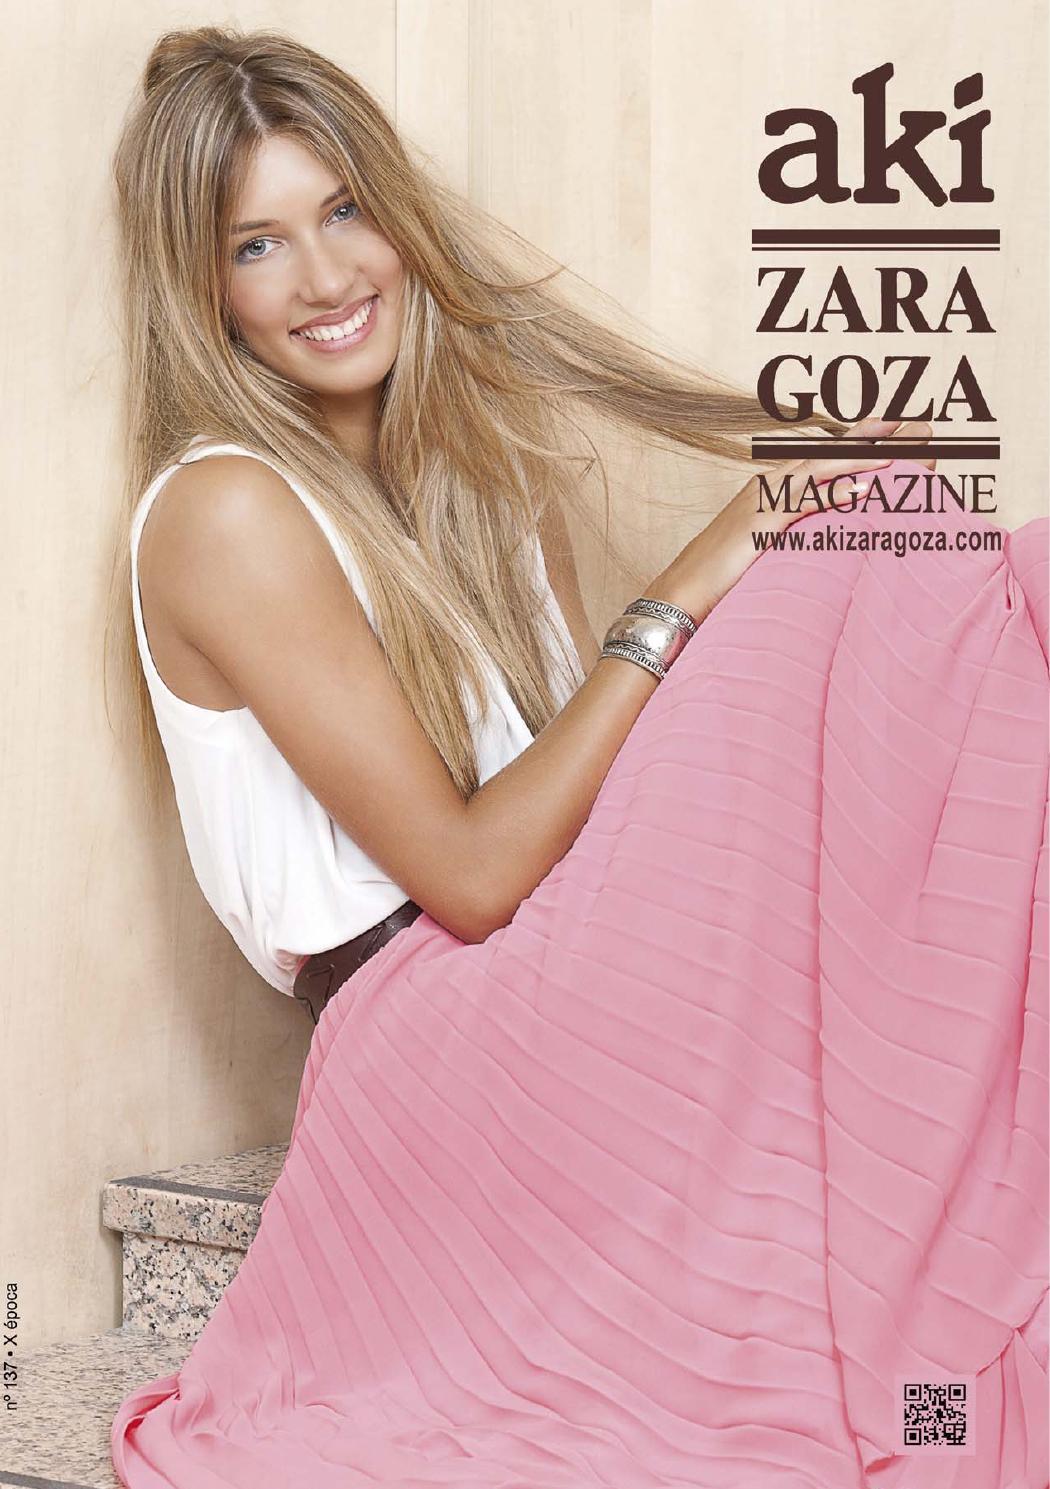 Aki Zaragoza Magazine 137 by Aki Zaragoza Magazine - issuu